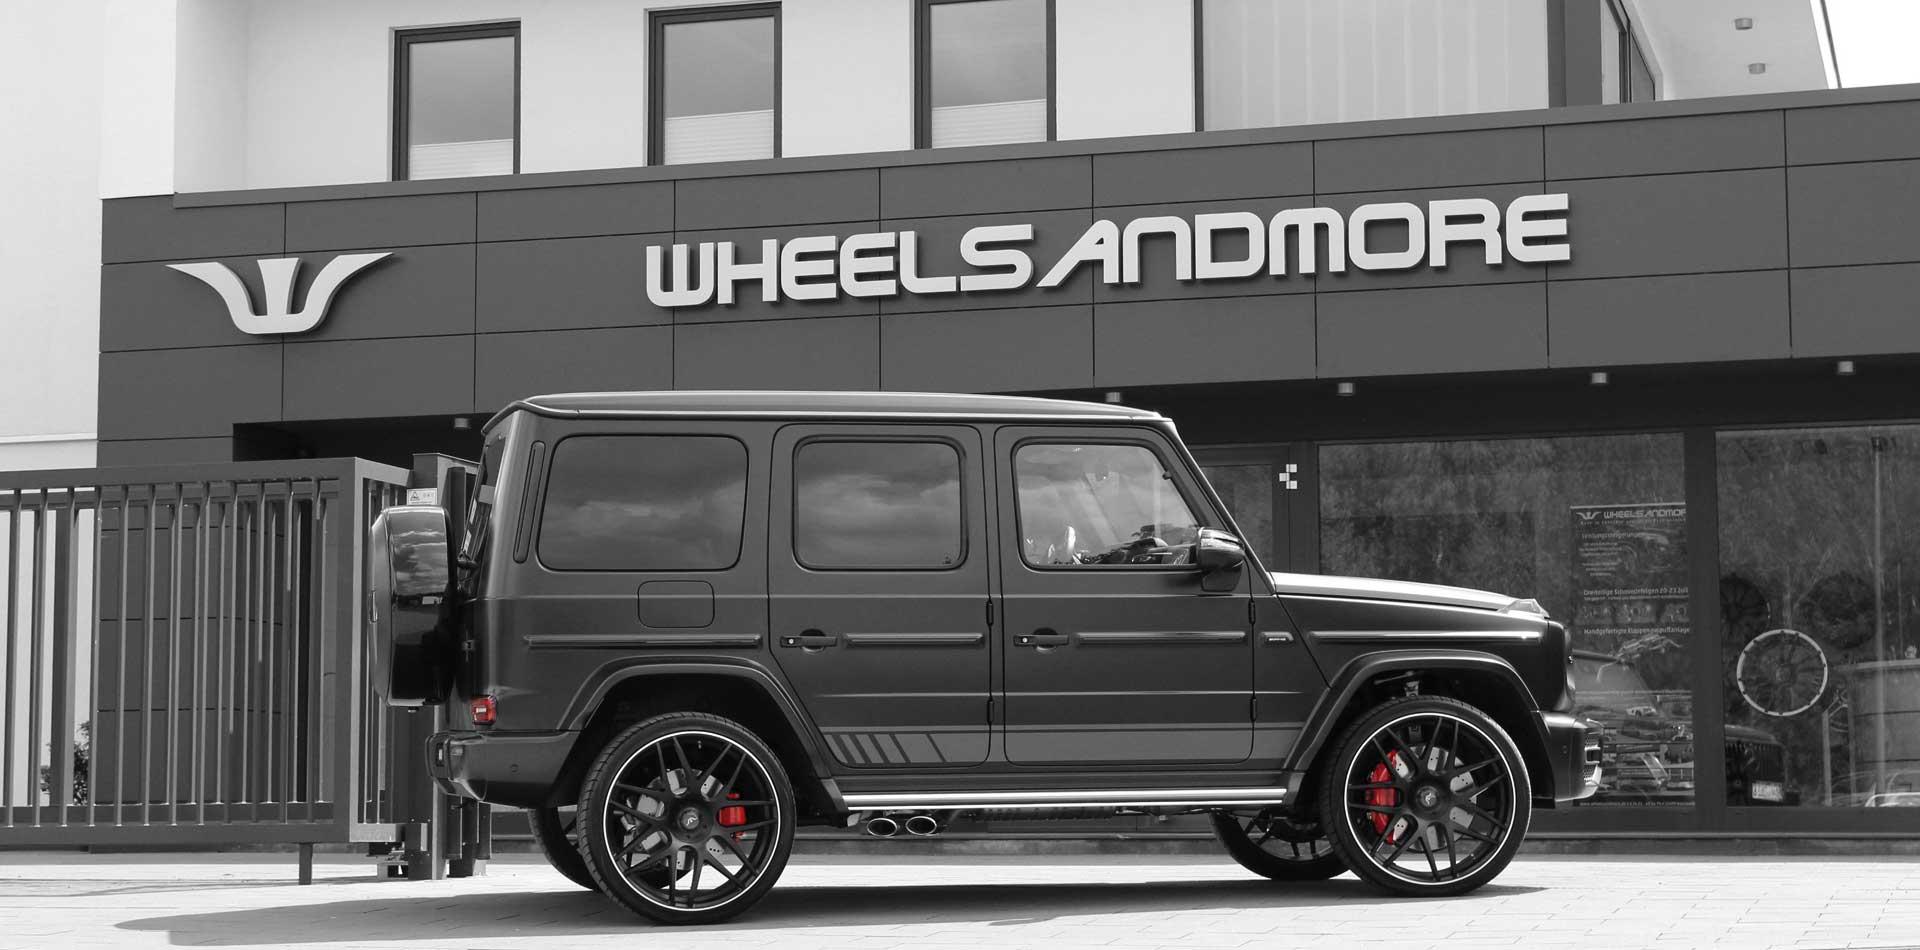 2019-mercedes-amg-g63-tuning-wheelsandmore-5.jpg